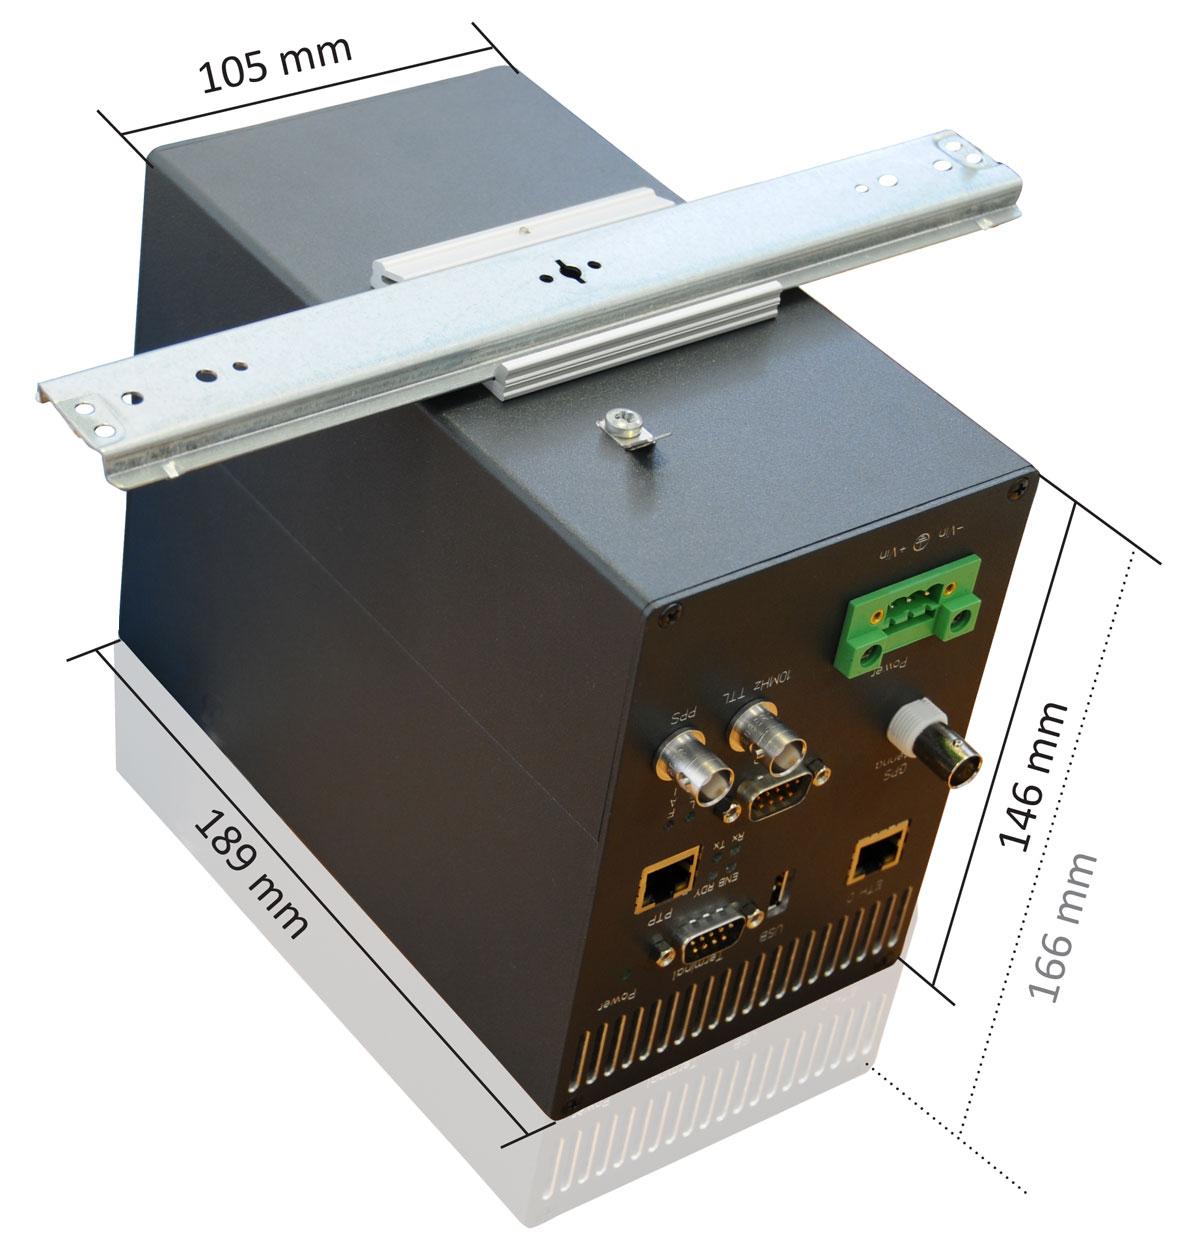 Meinberg LANTIME M400: The New De Facto Standard for